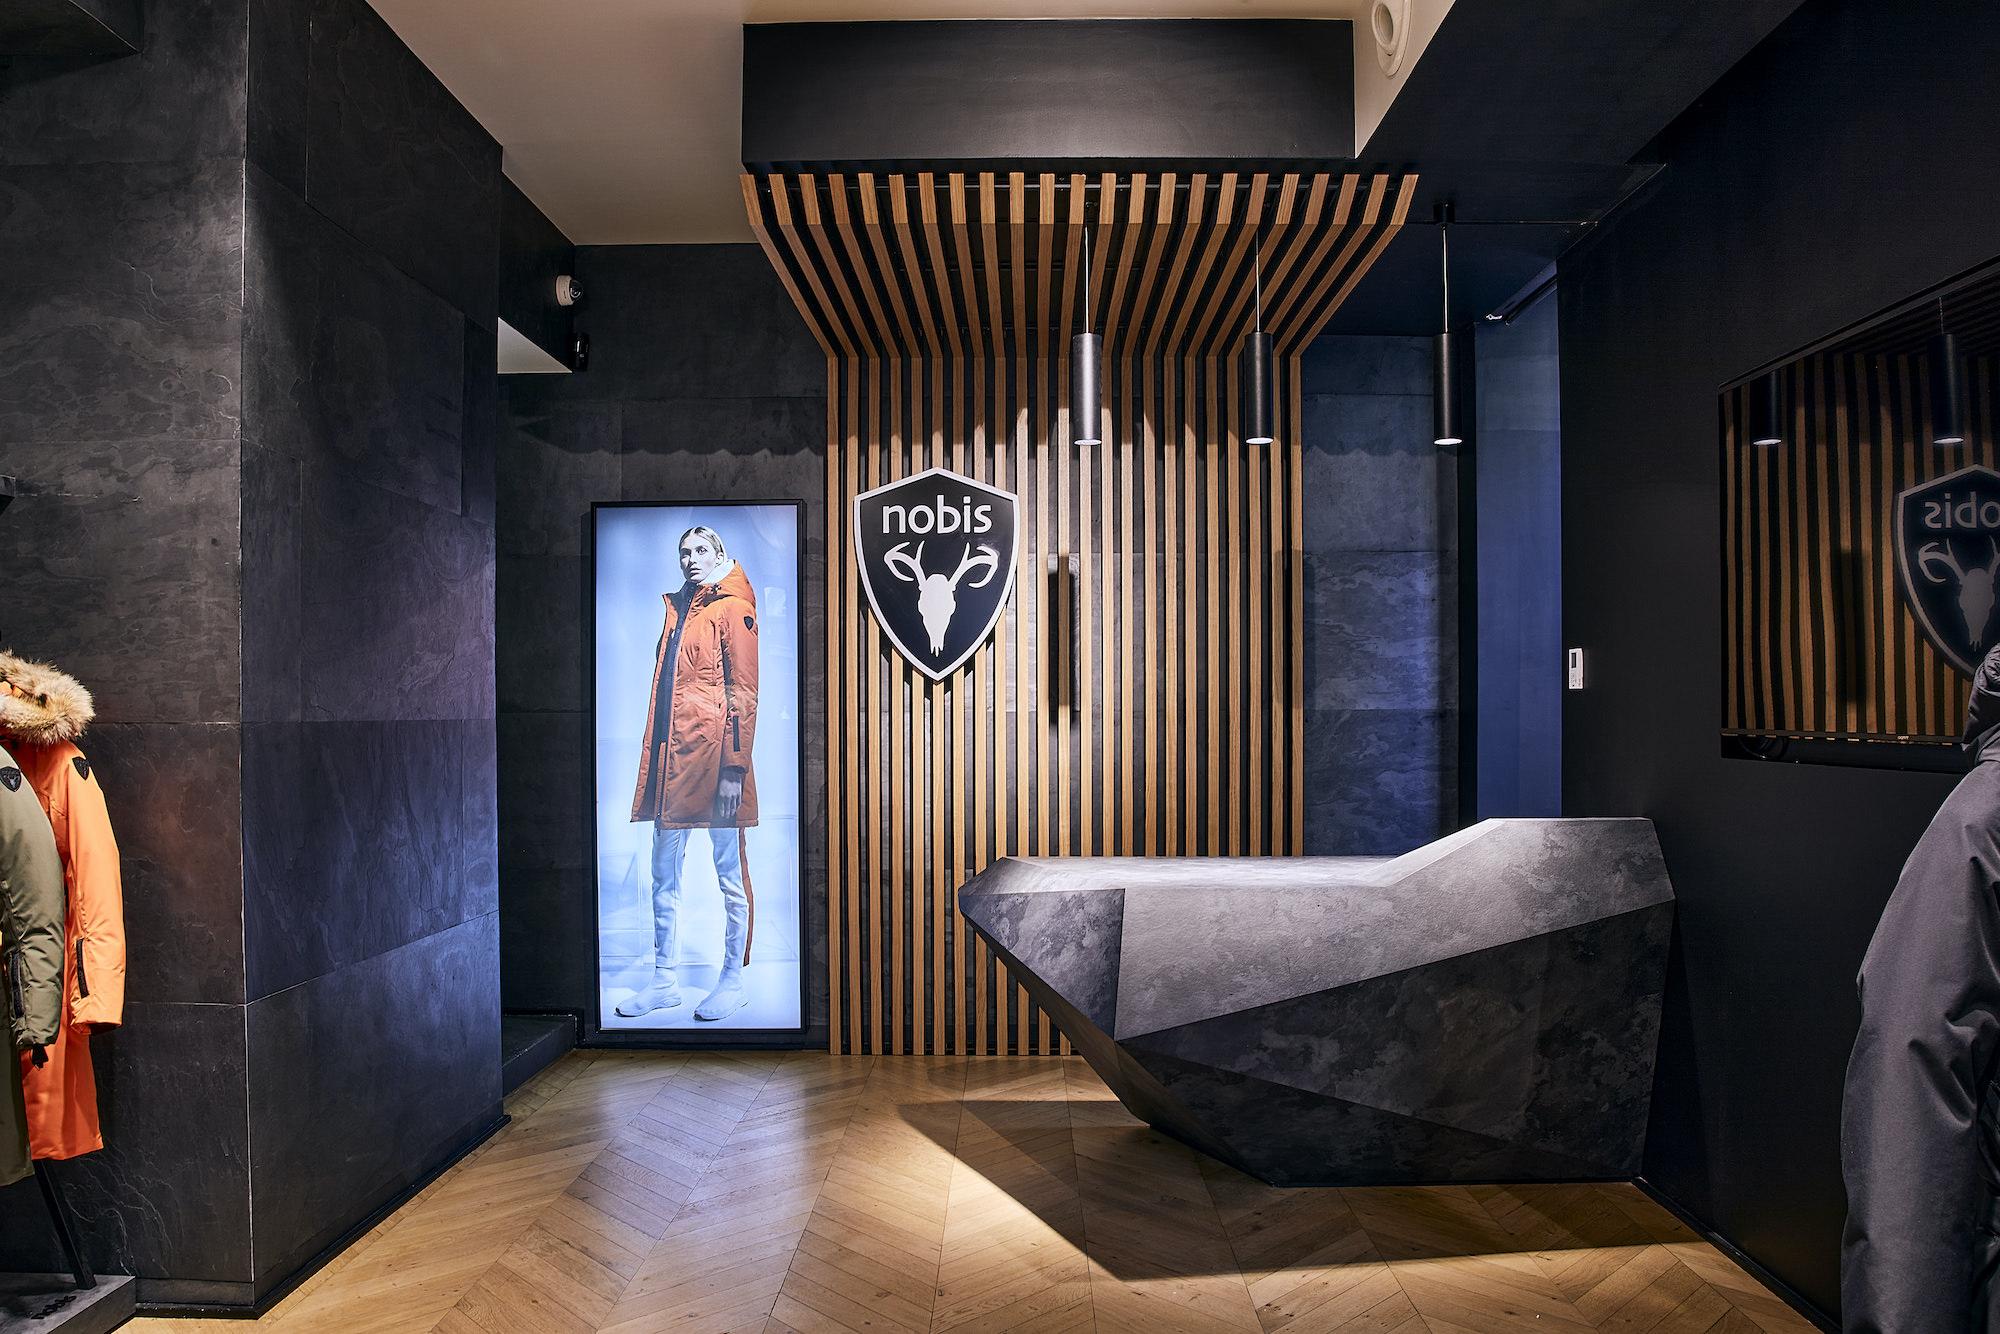 nobis flagship store